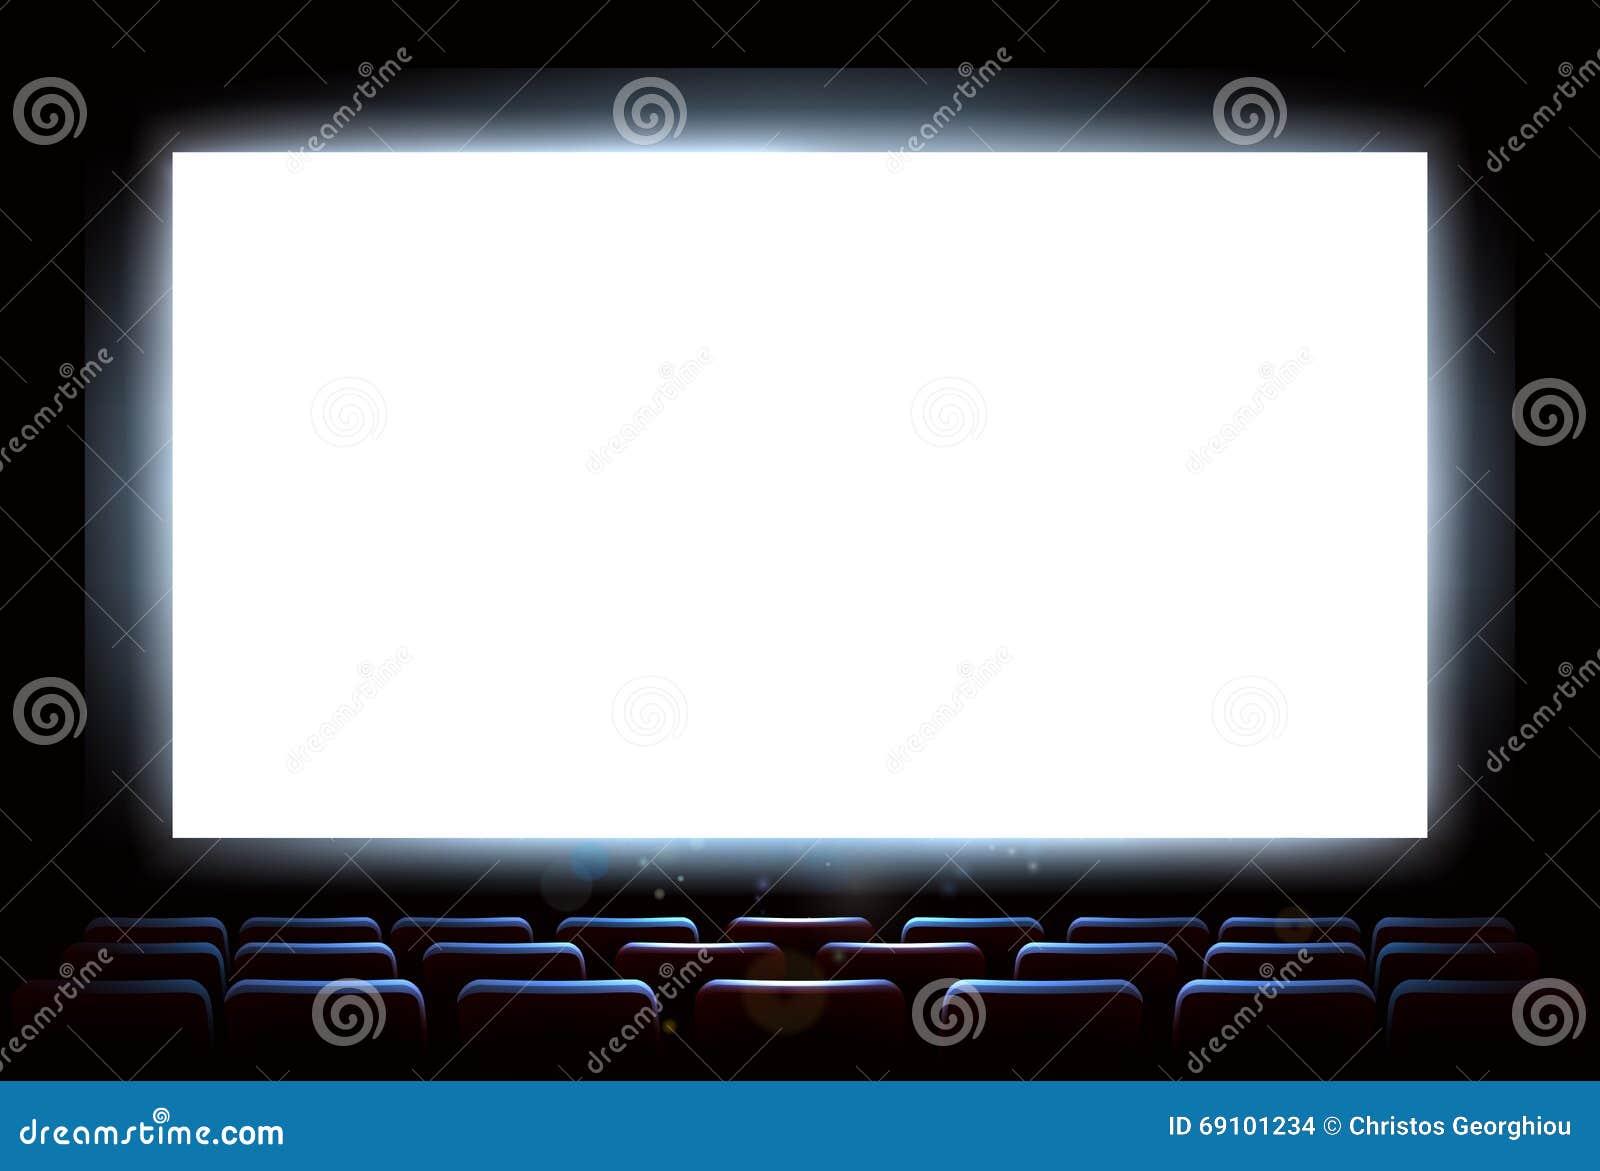 Cinema Movie Theatre Screen Vector Illustration